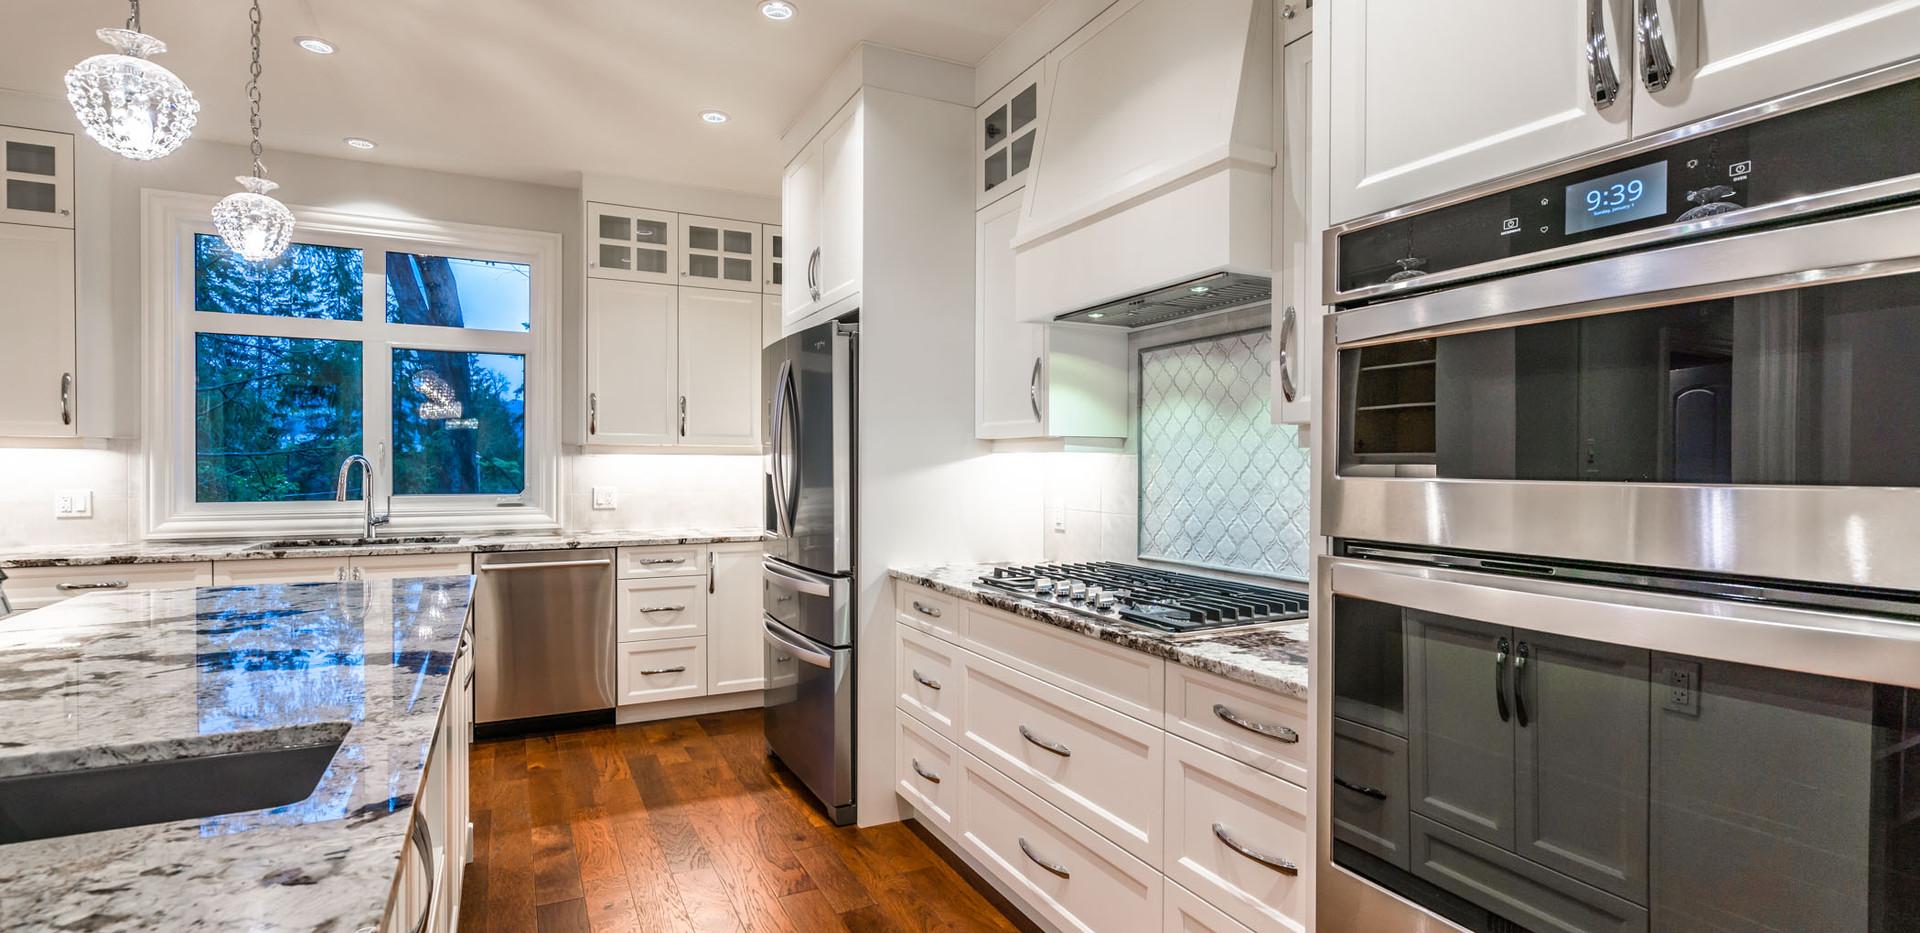 2847 Ashcraft Main House Kitchen13.jpg